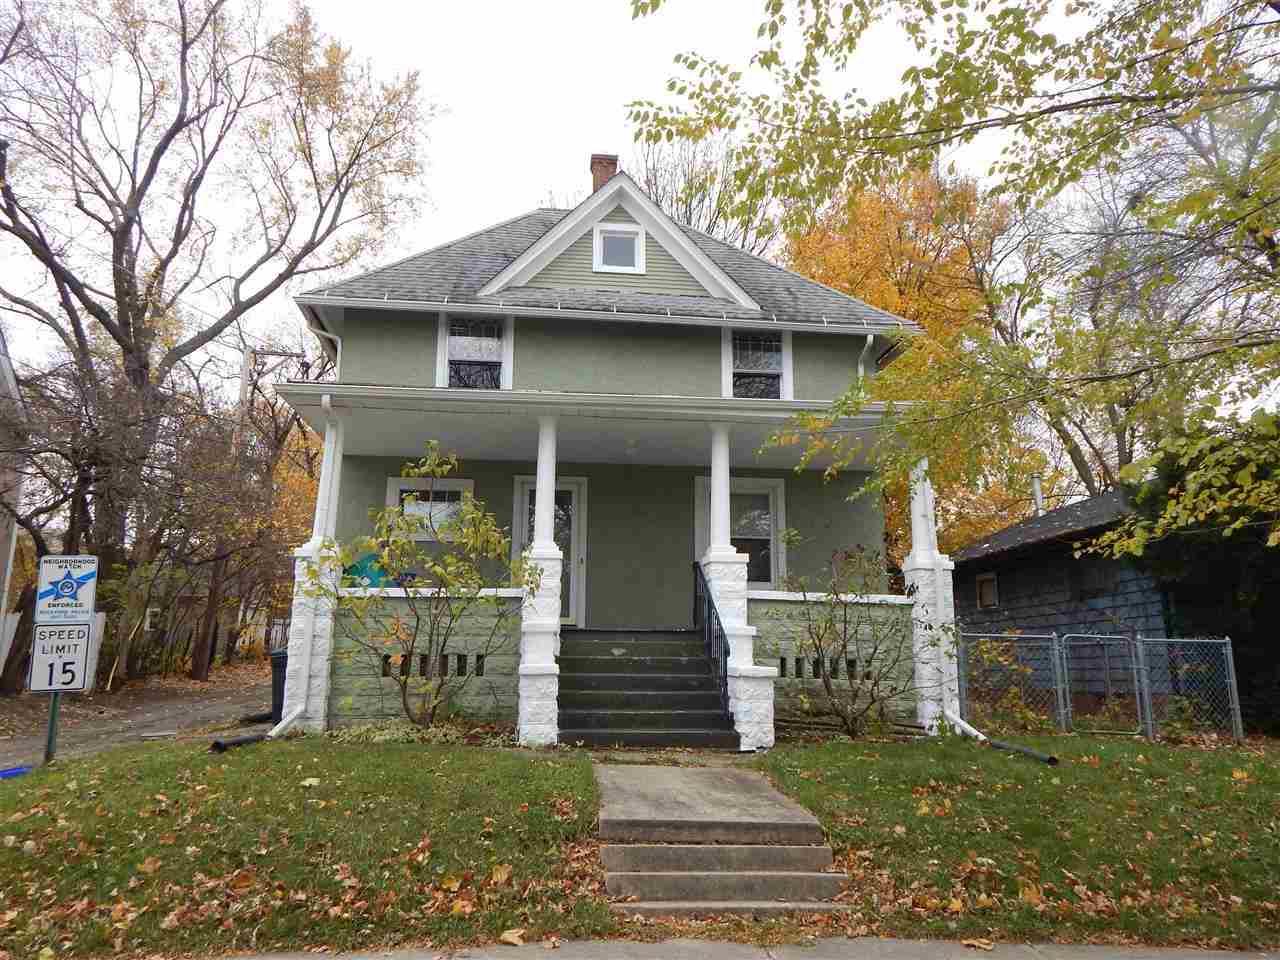 1319 Crosby St, Rockford, IL